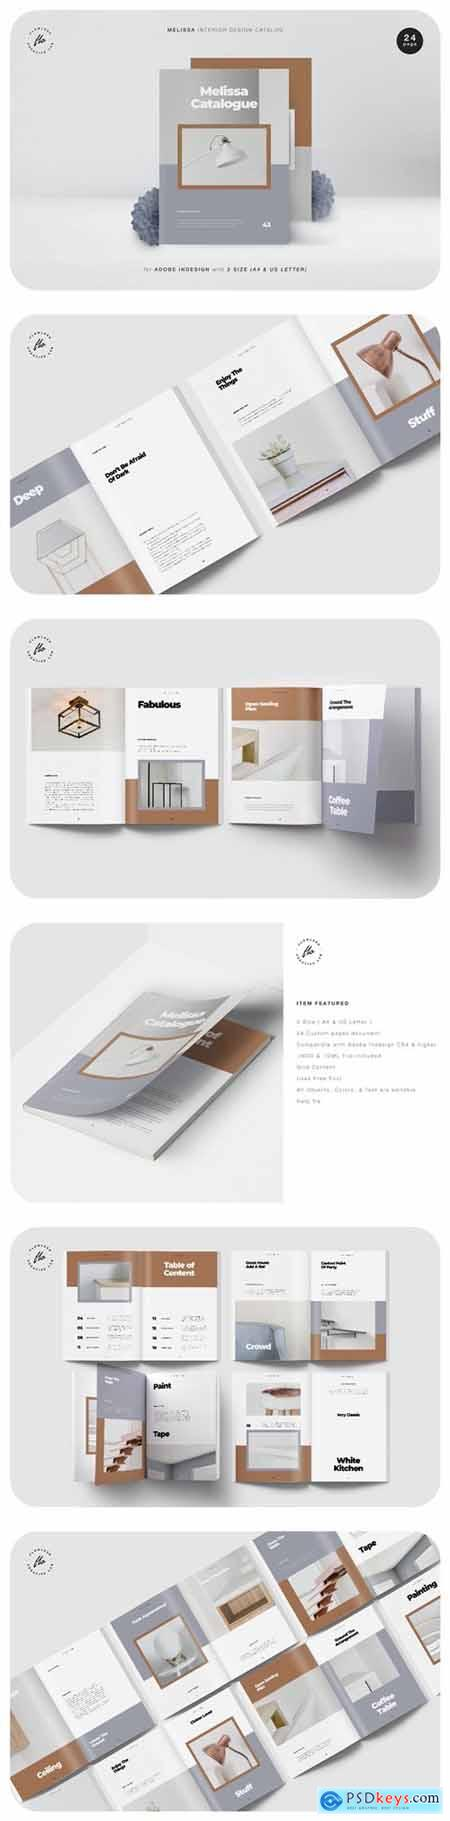 Melissa Interor Design Catalog